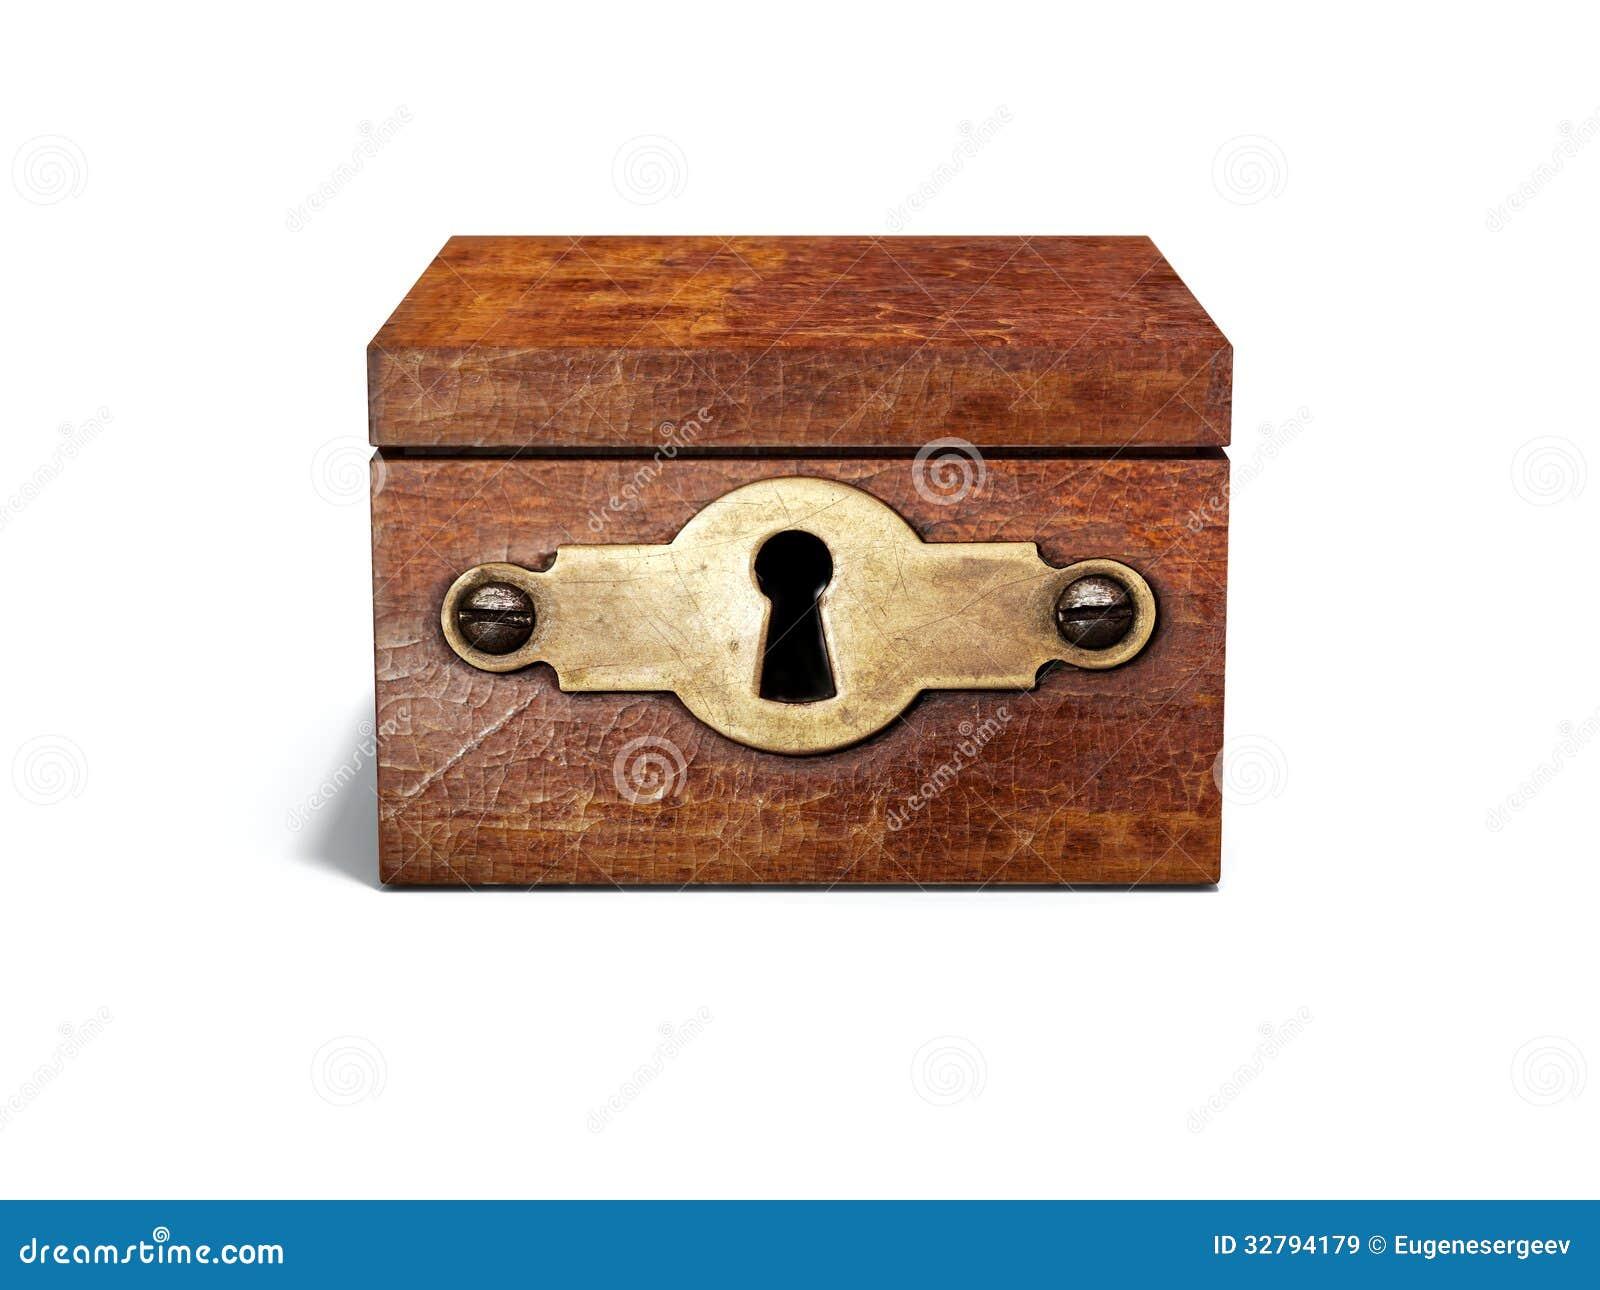 Box With Lock And Key India Emergency Key Boxes Big Size  : vintage wooden box metal keyhole decorative isolated white 32794179 from www.checkoutethiopia.com size 1300 x 1065 jpeg 114kB